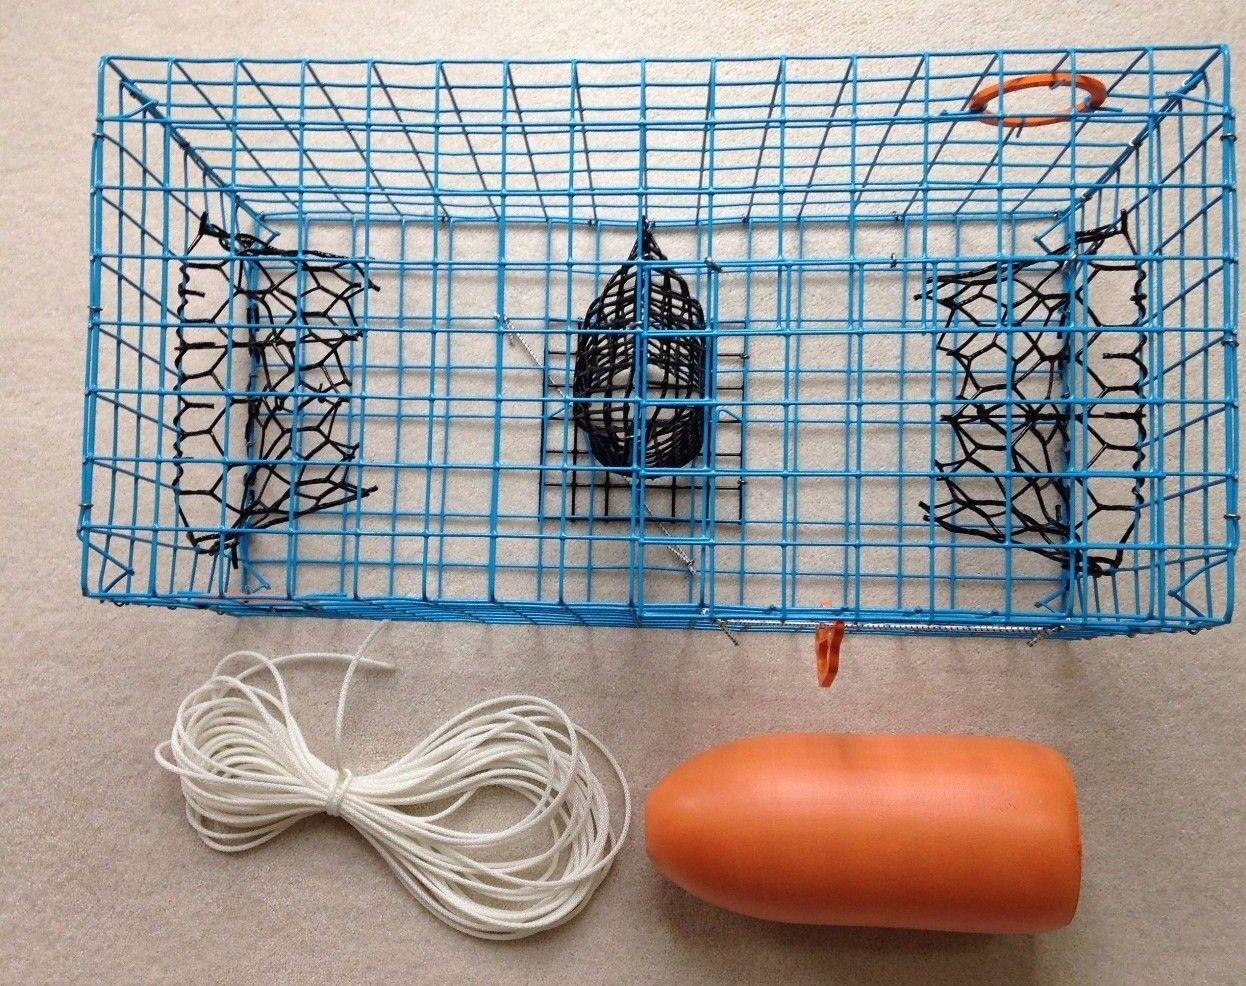 PVC Cangrejo Azul Grado Comercial Olla, 2 TRD's & 50 ft (approx. 15.24 m) línea & Naranja Flotador 5x11